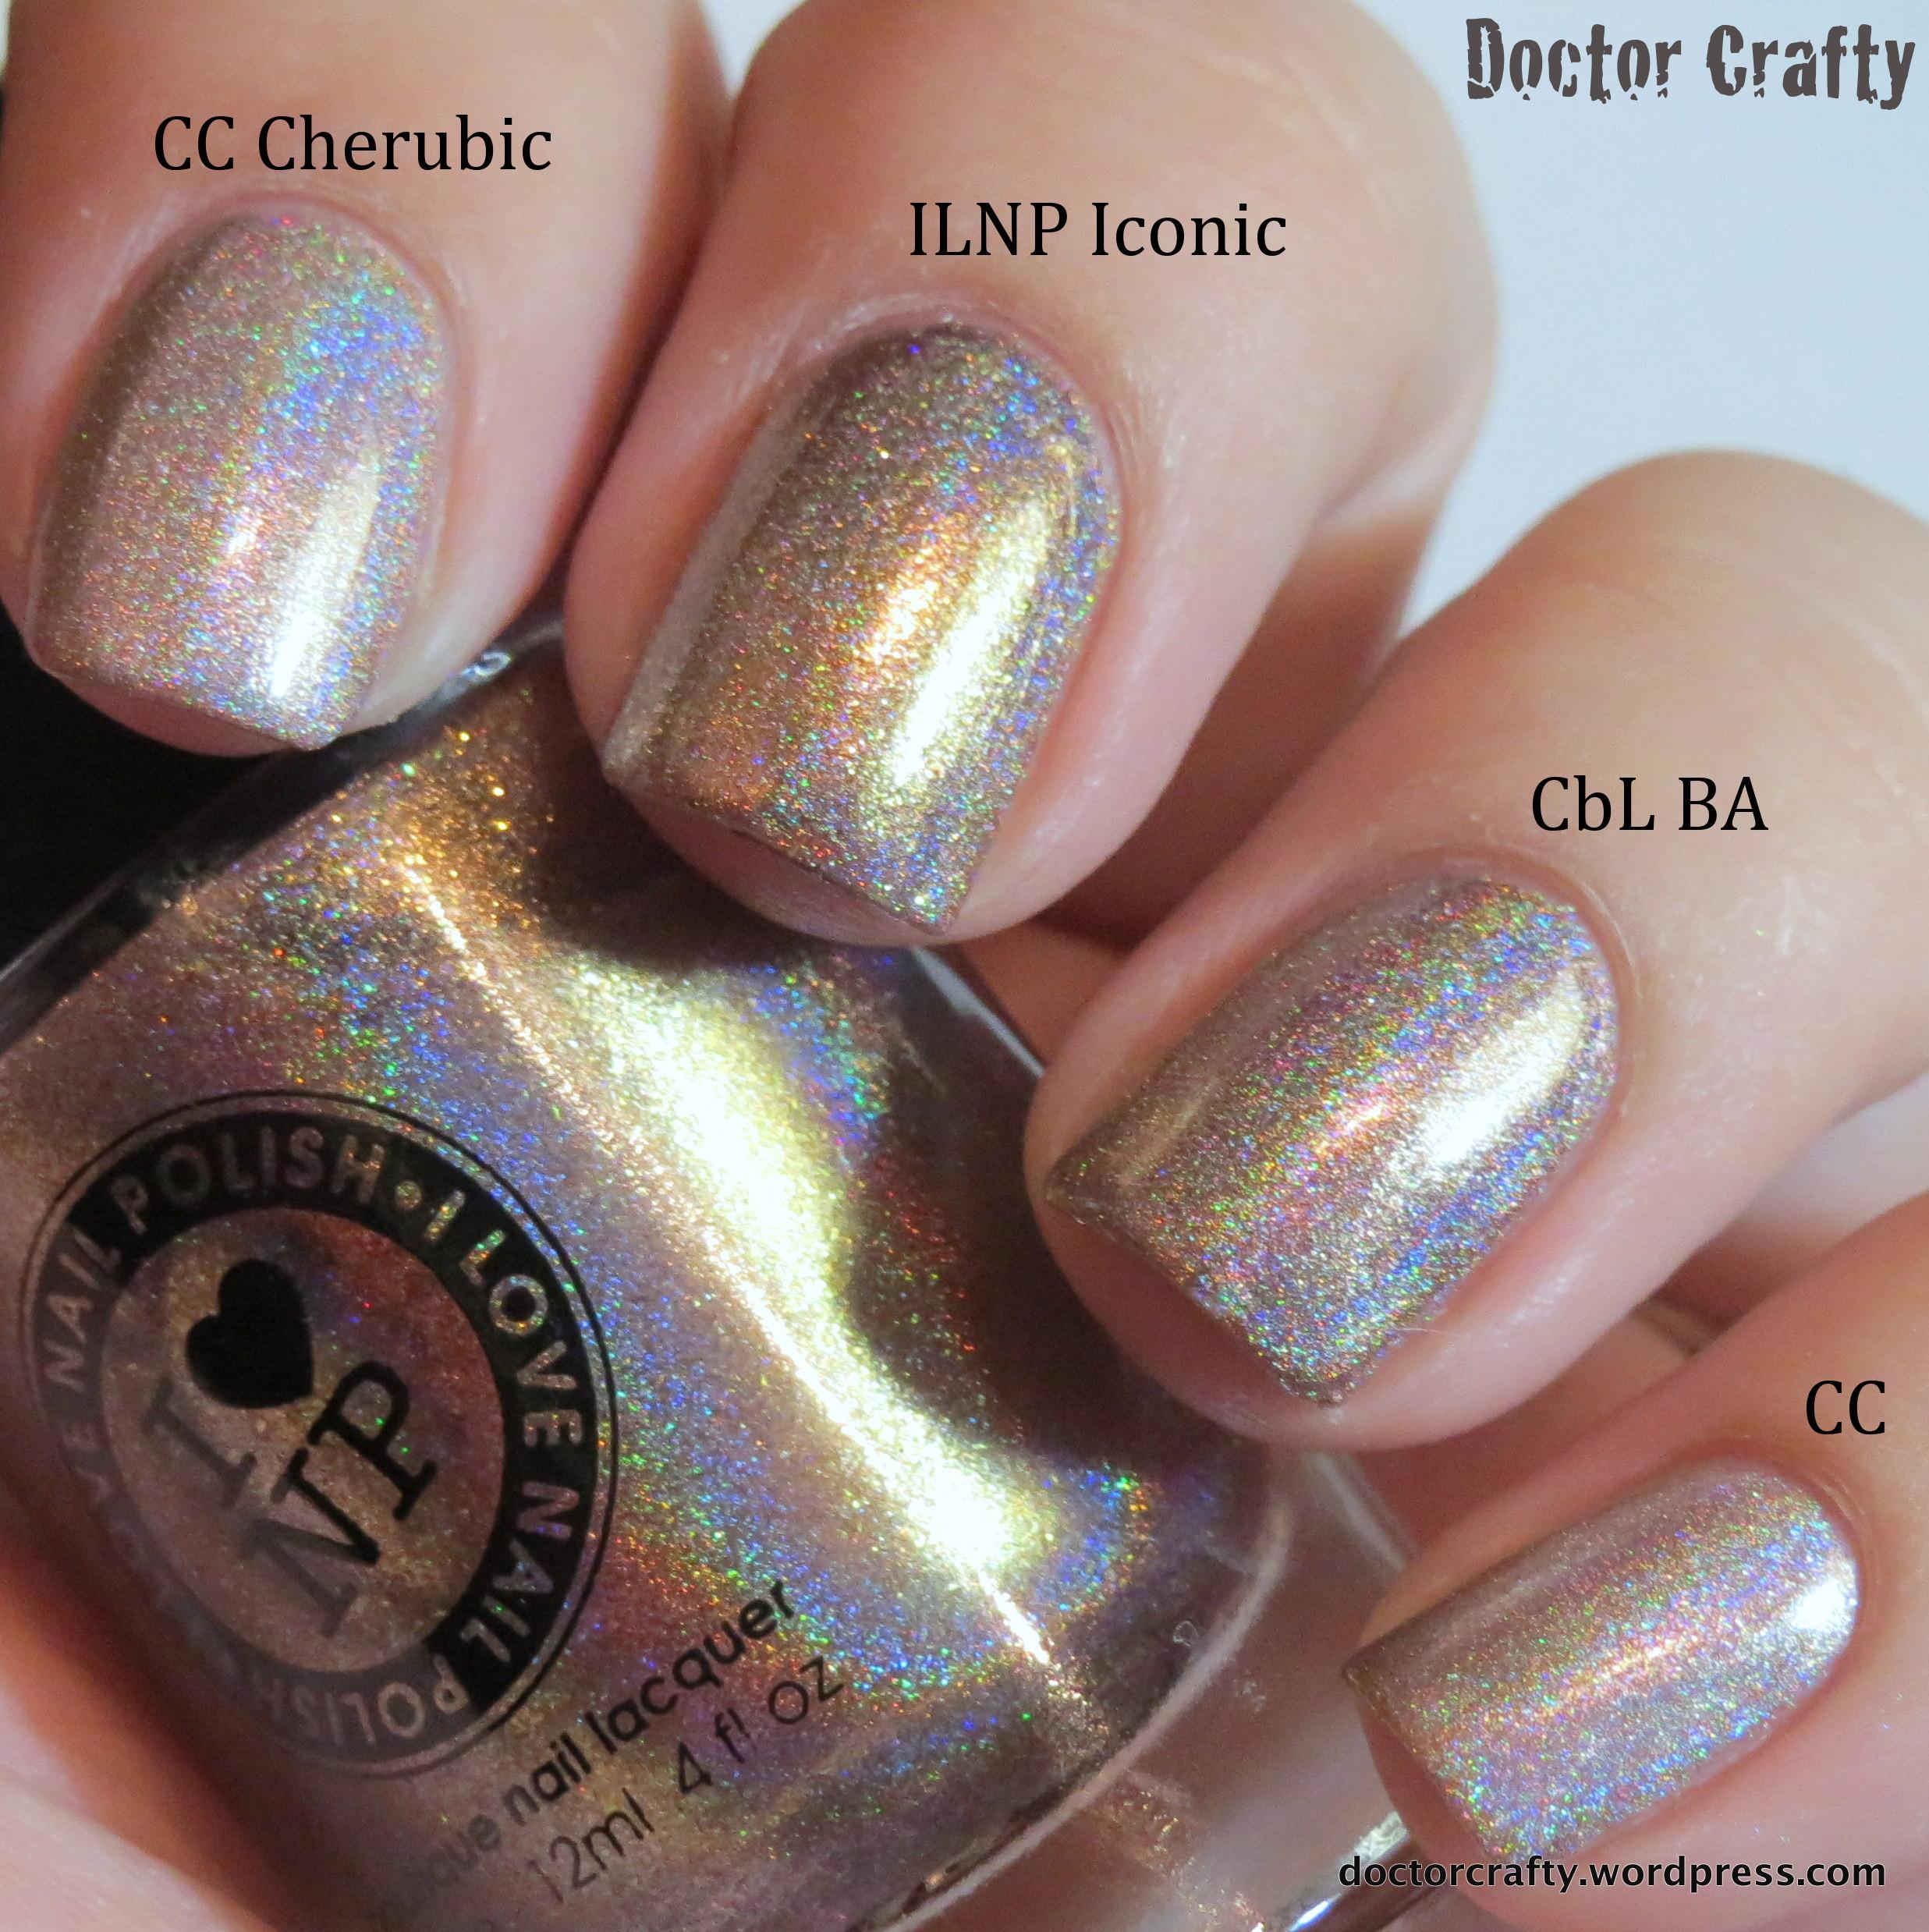 I Love Nail Polish | Doctor Crafty | Page 2